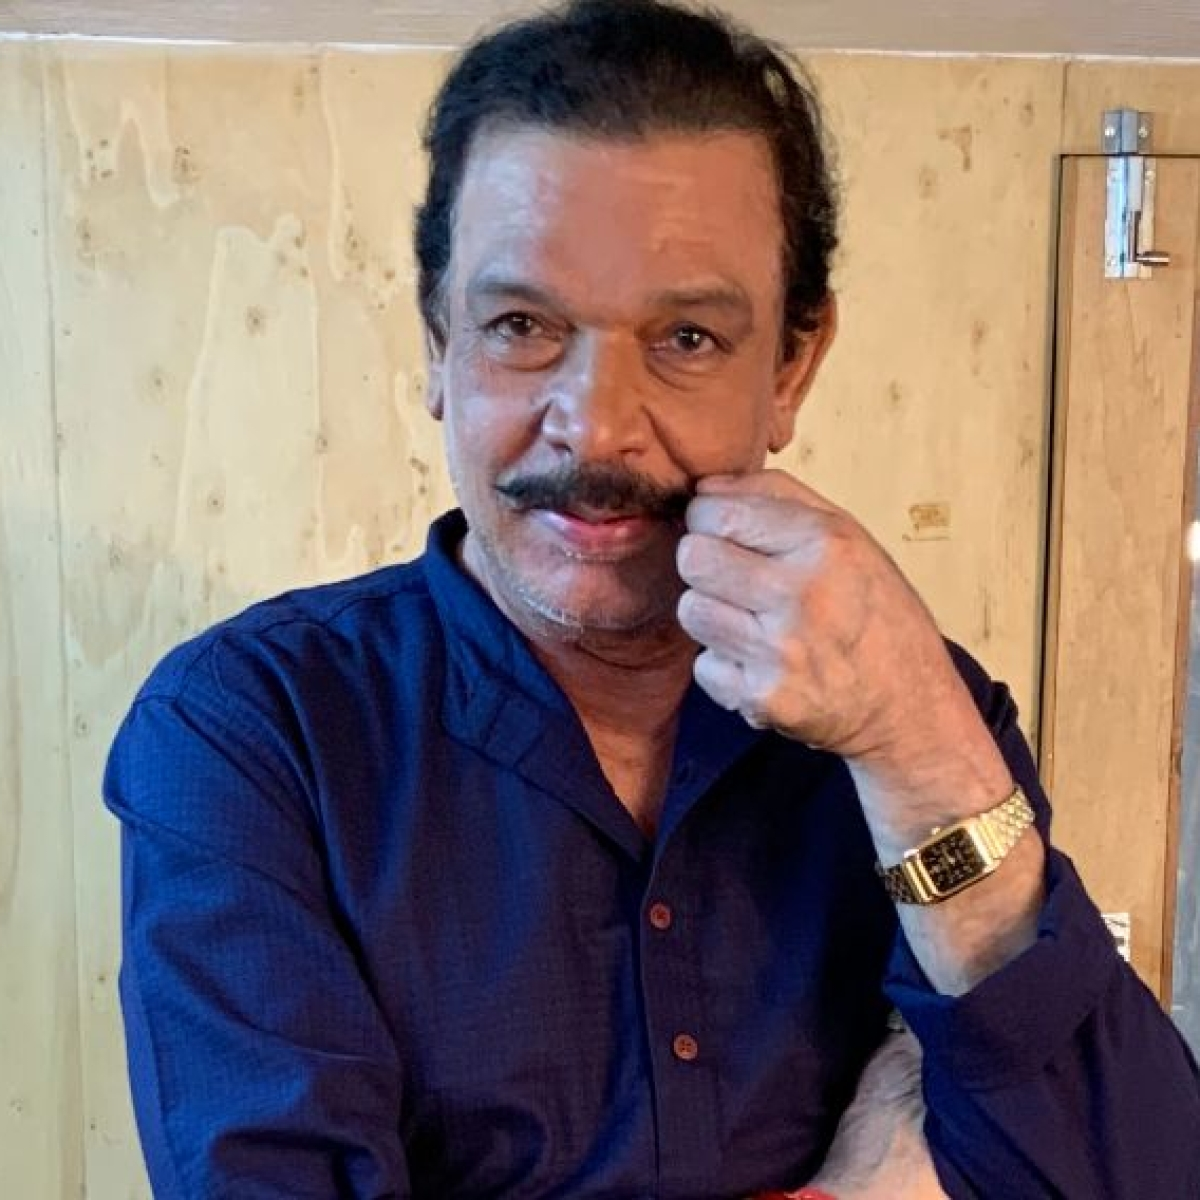 'OTT has created an opportunity for new characters', says Bollywood's OG villain Govind Namdev